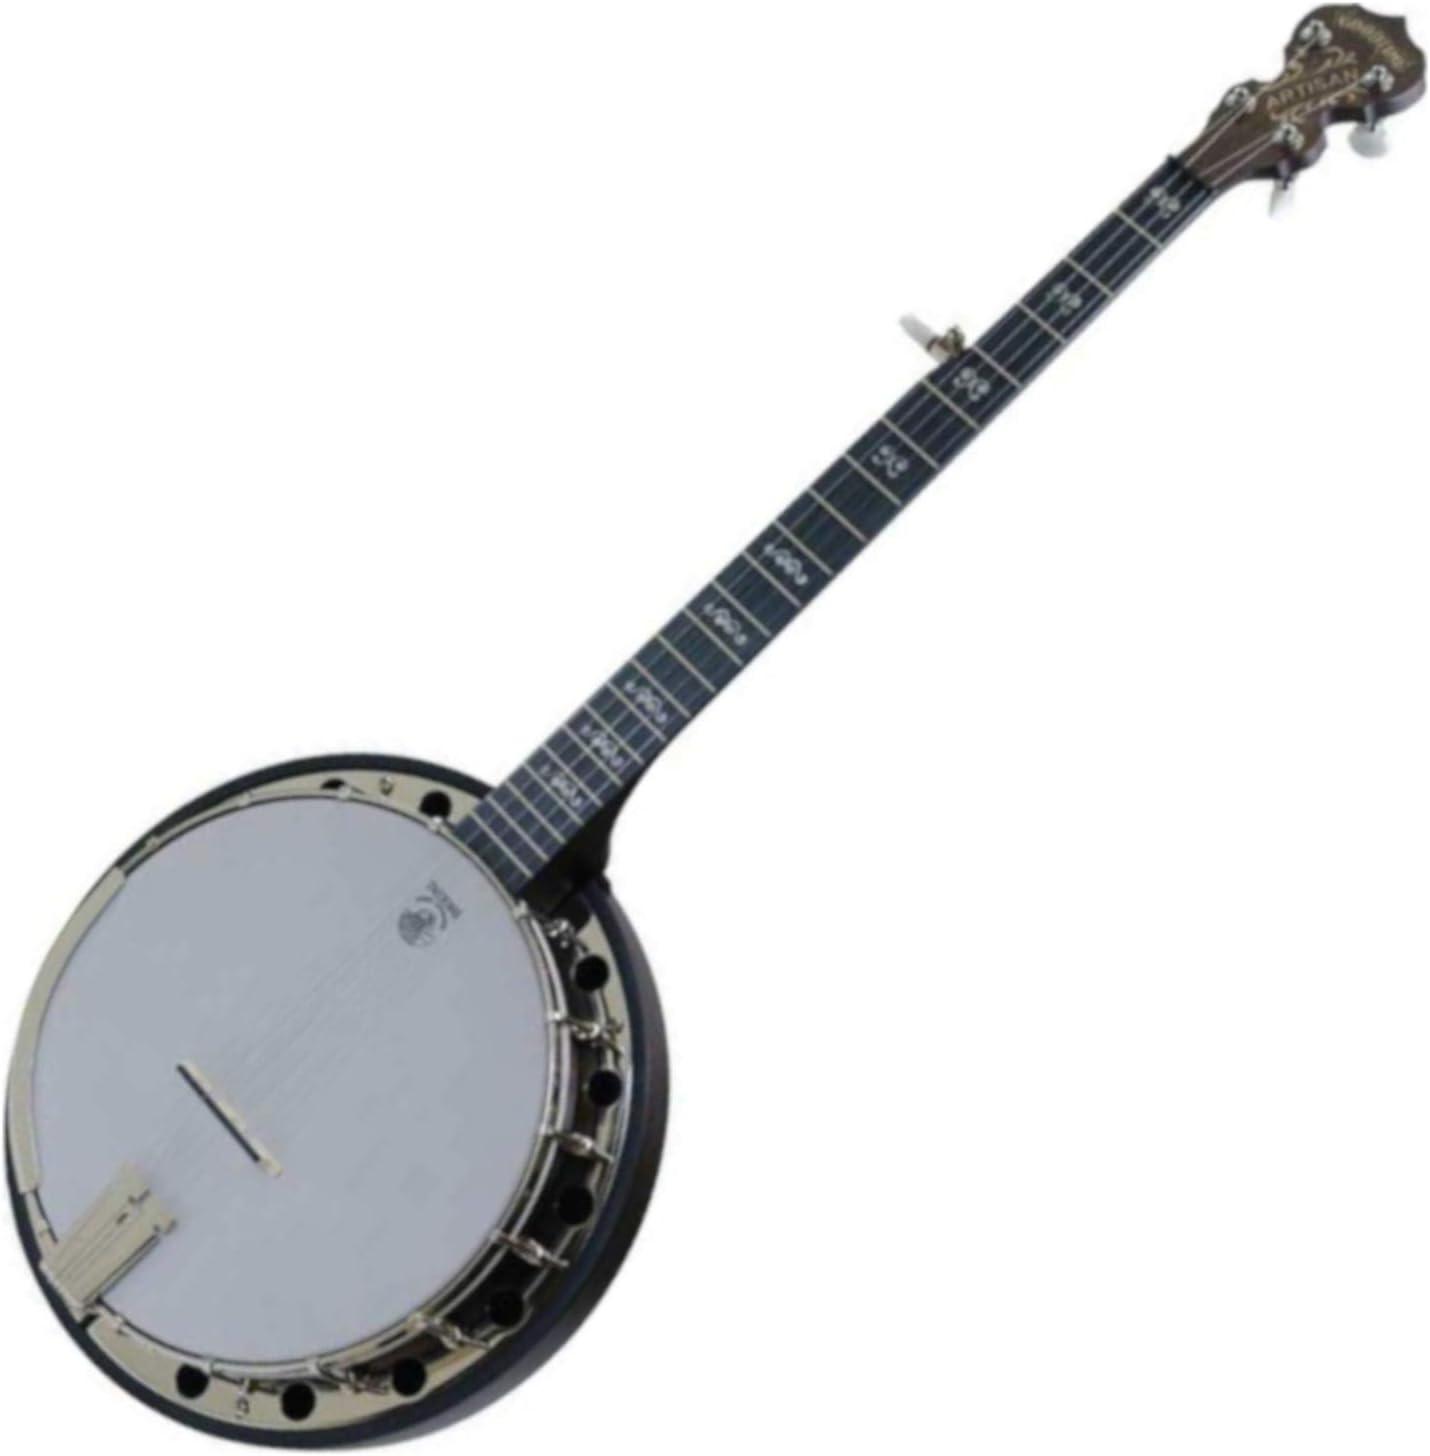 Deering A2 Artisan supreme Goodtime with Two Resonator Spring new work Banjo